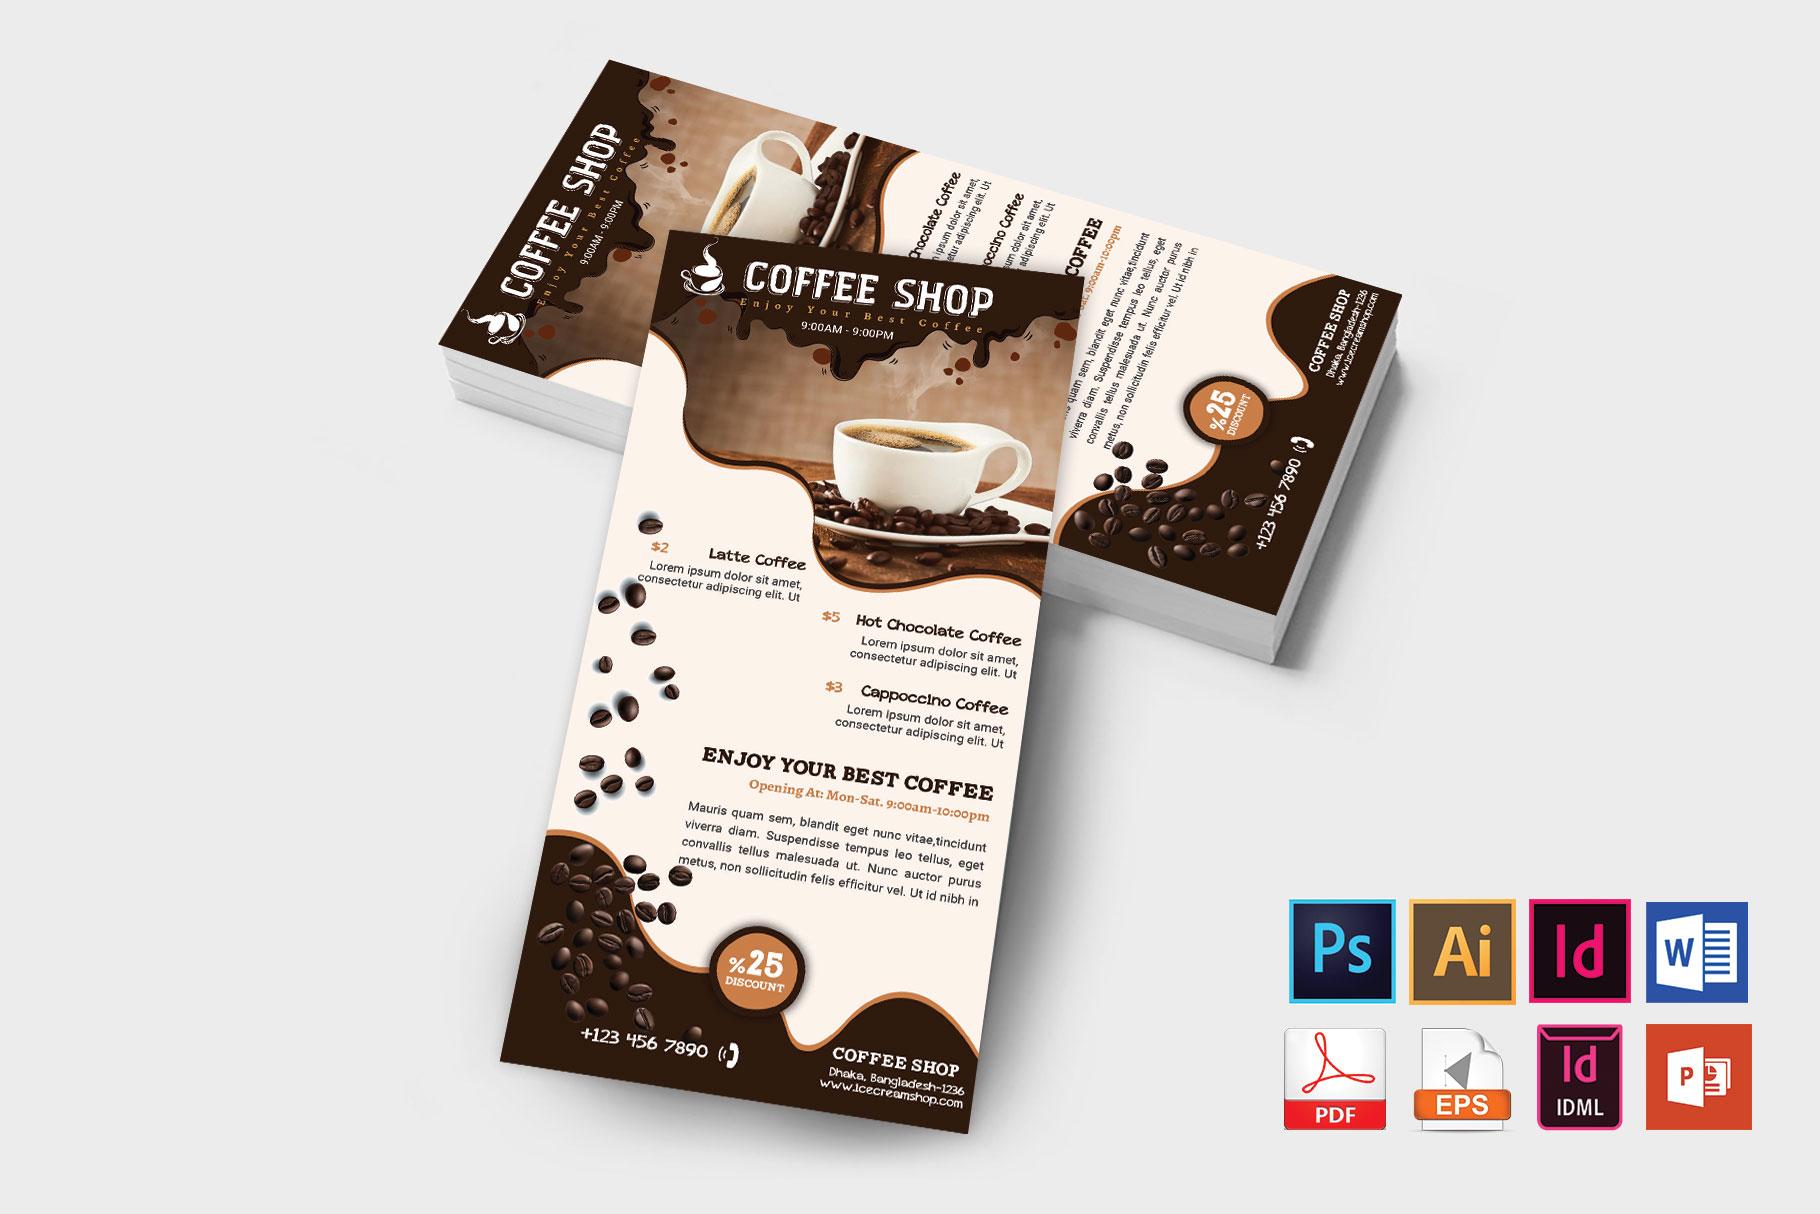 Rack Card   Coffee Shop DL Flyer Vol-02 example image 2